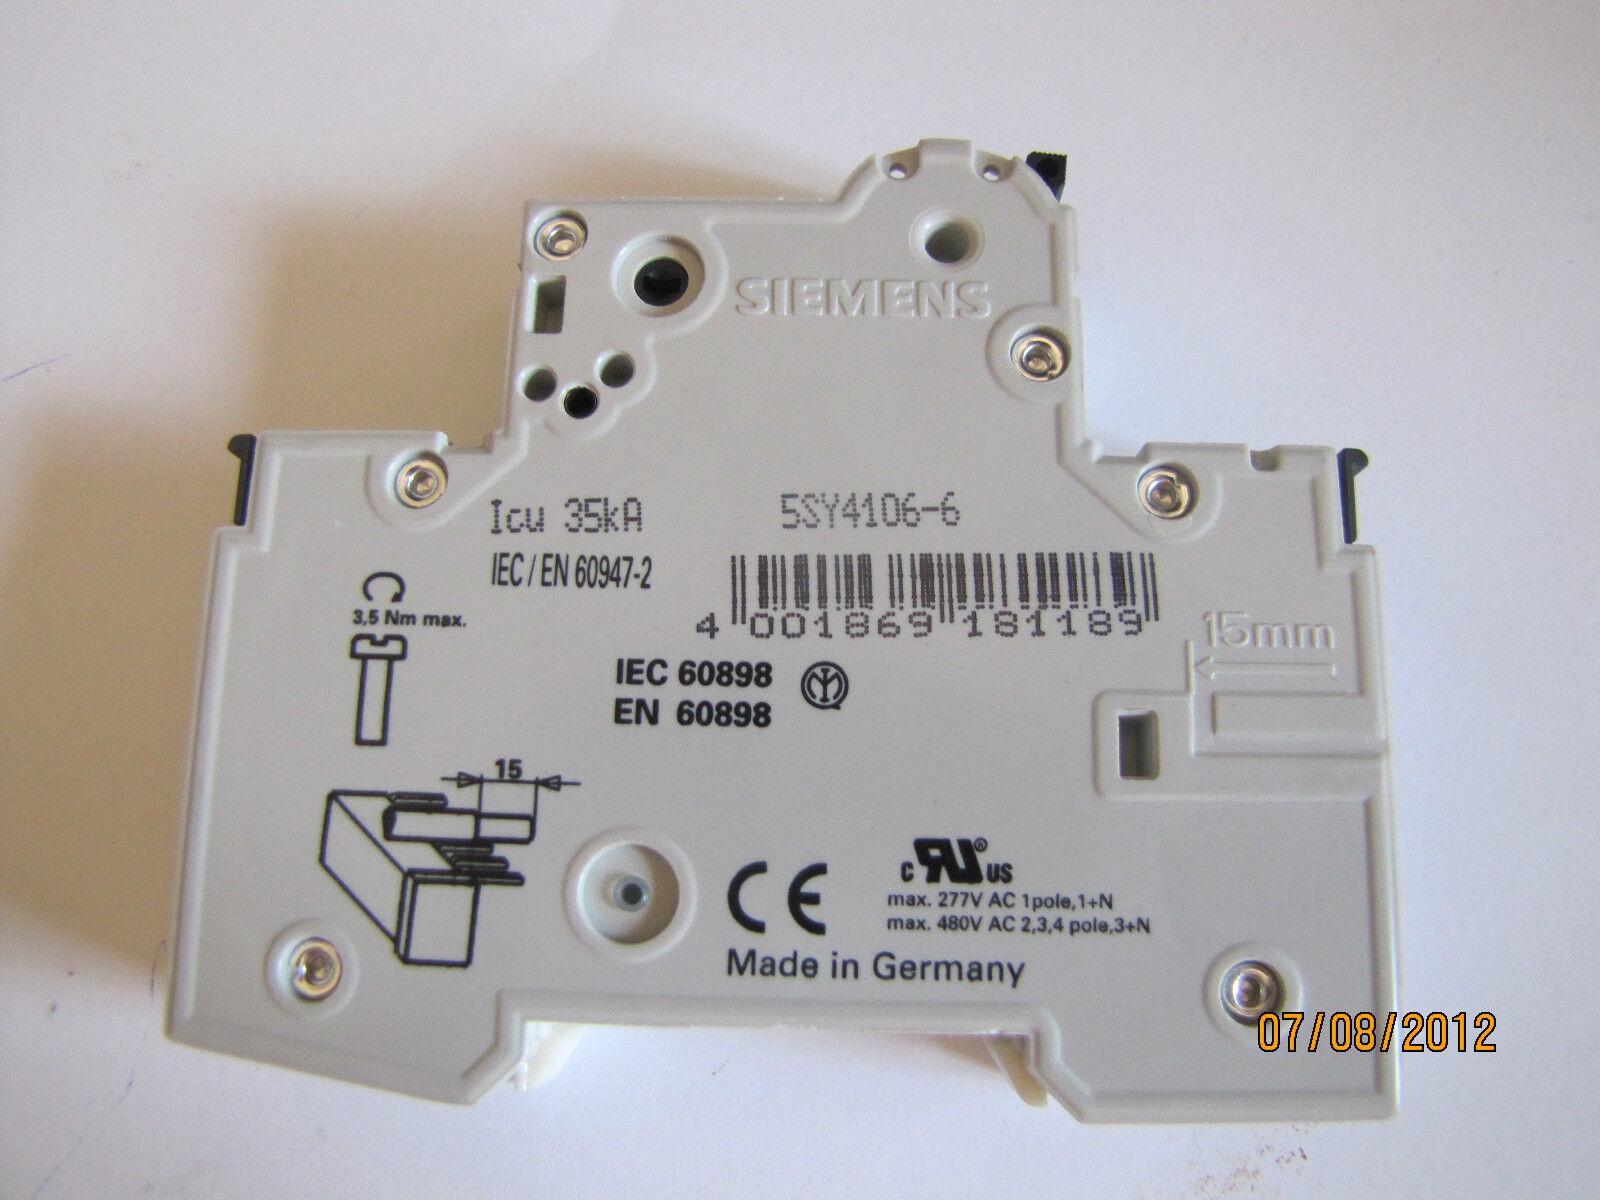 Siemens B6 Circuit Breaker 5sy4 106 6 Ebay Used Breakers Ite E43b060 60 Amp 3 Pole